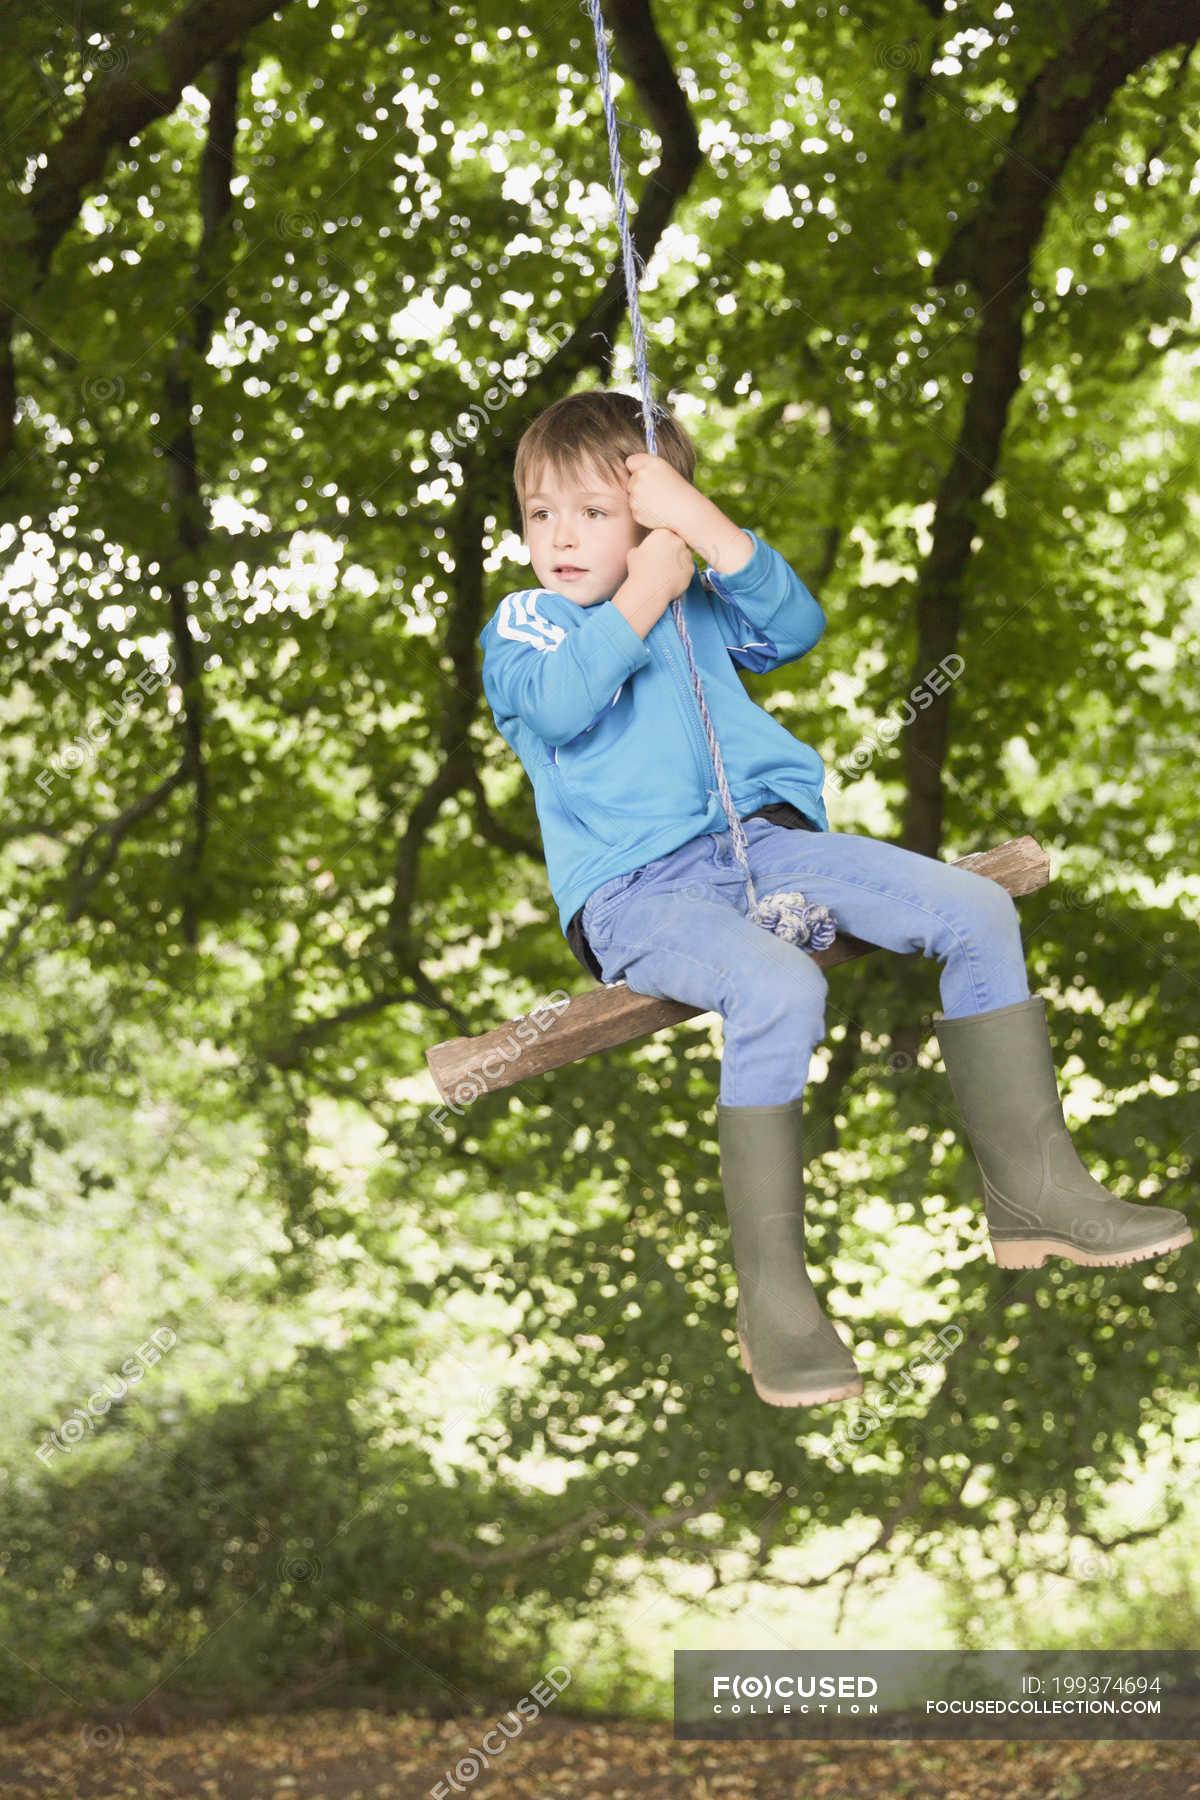 Swing swinging tree topic has